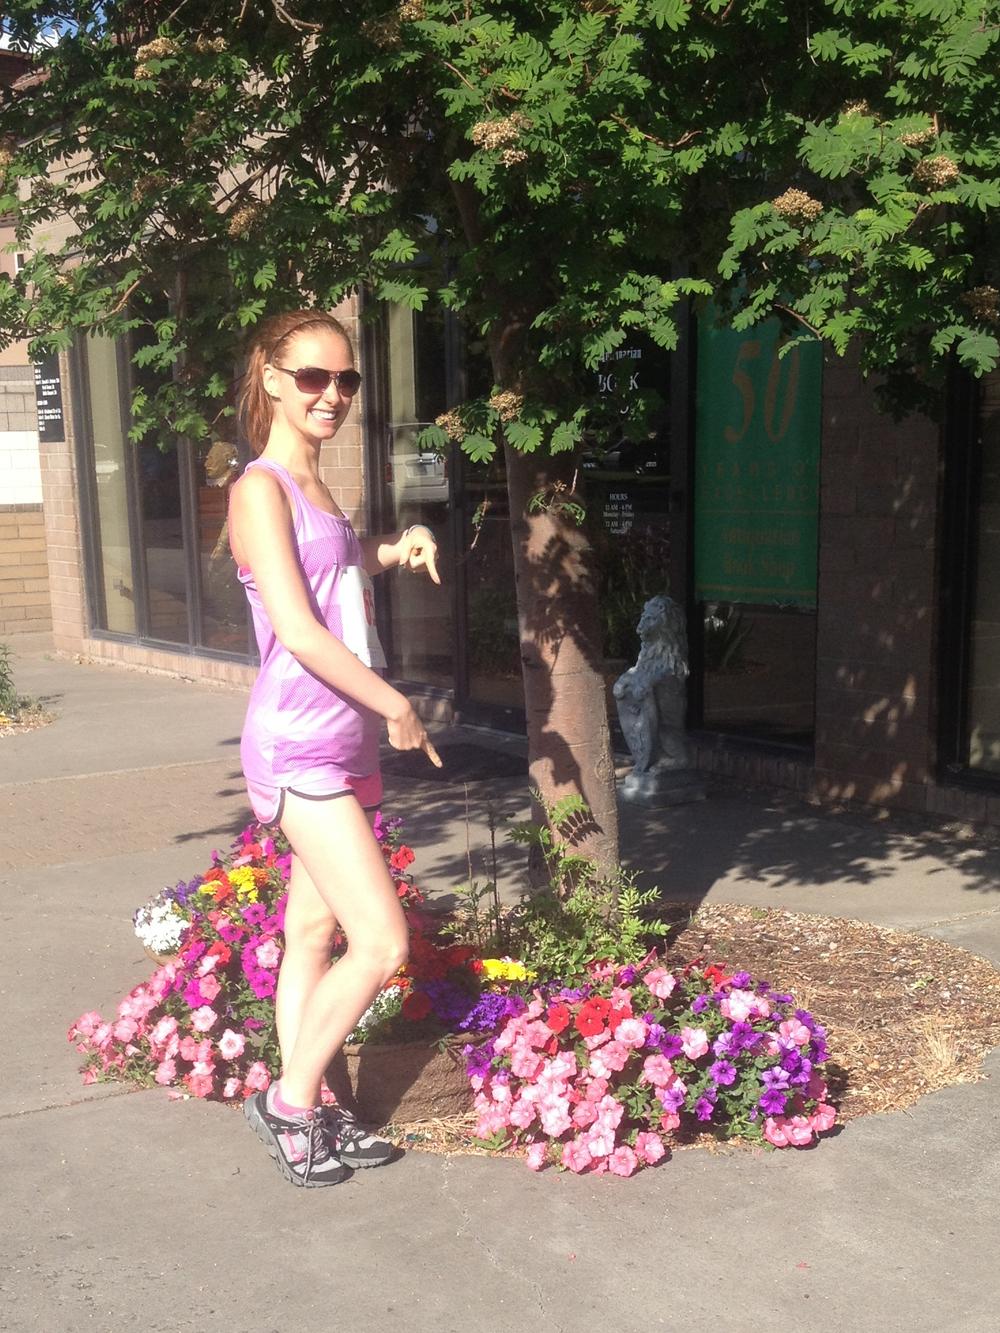 Enjoying the matching flowers post-run :)